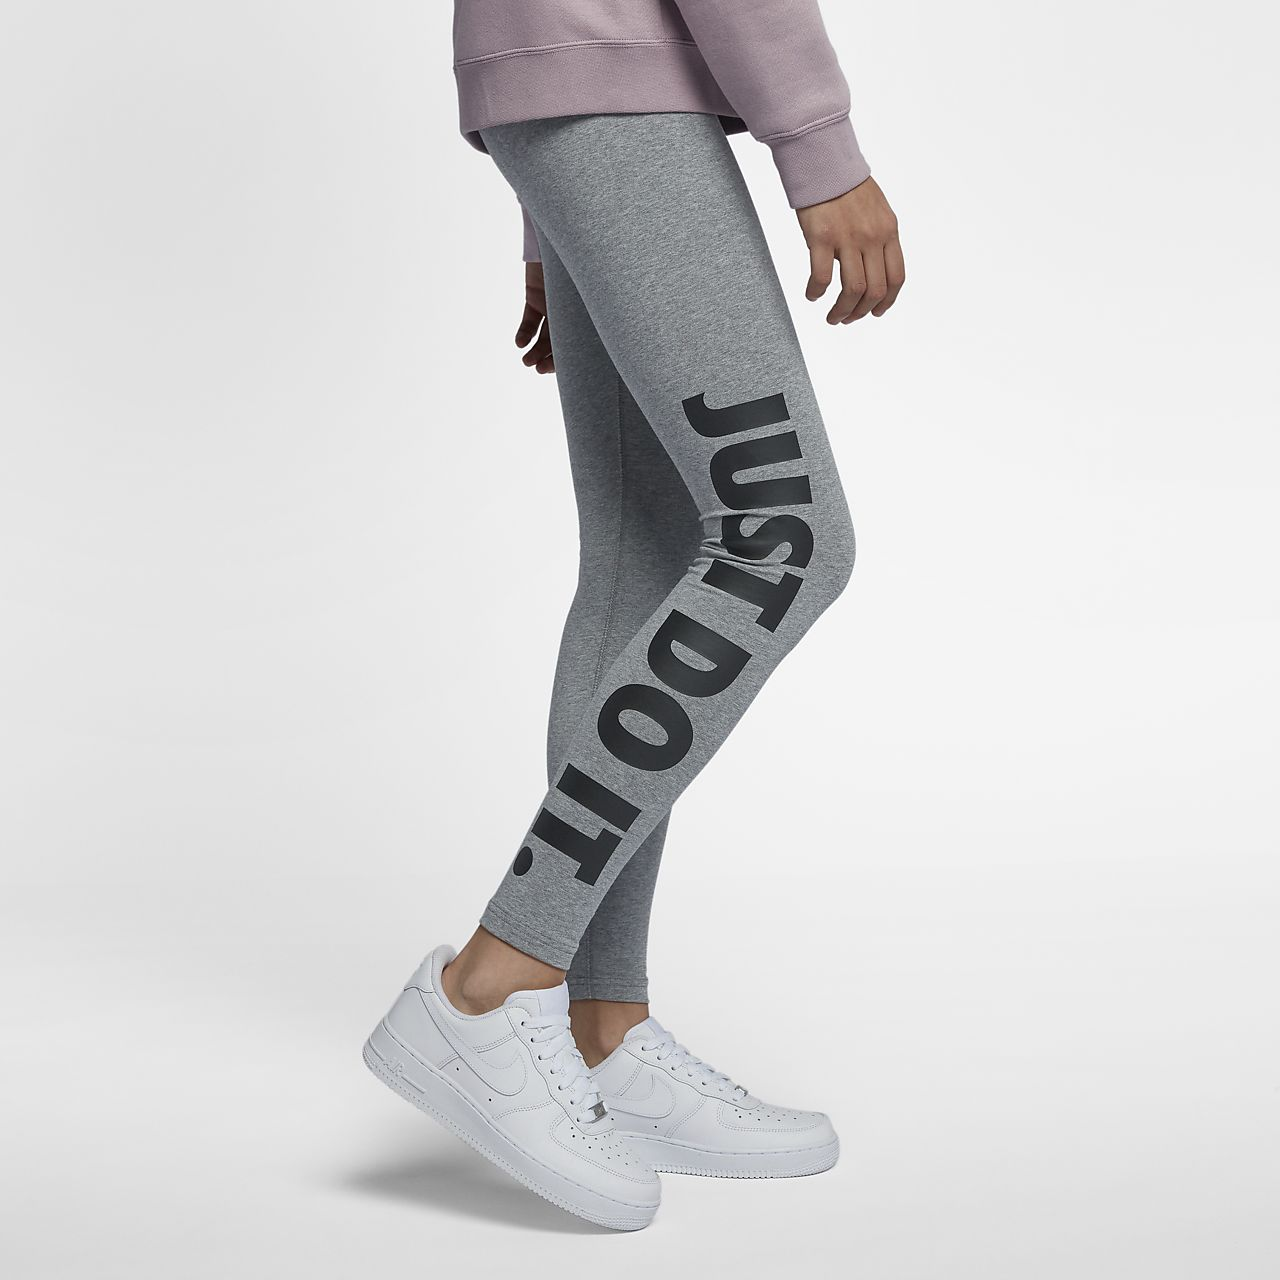 nike free run 2 size 6 uk trousers